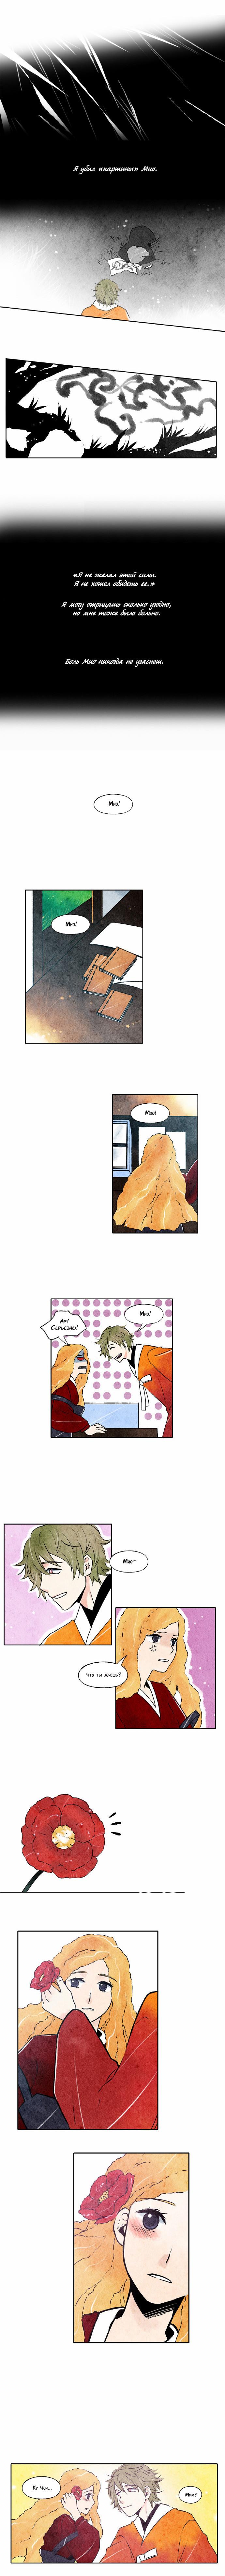 https://r1.ninemanga.com/comics/pic2/39/22503/416373/1532884261504.jpg Page 2